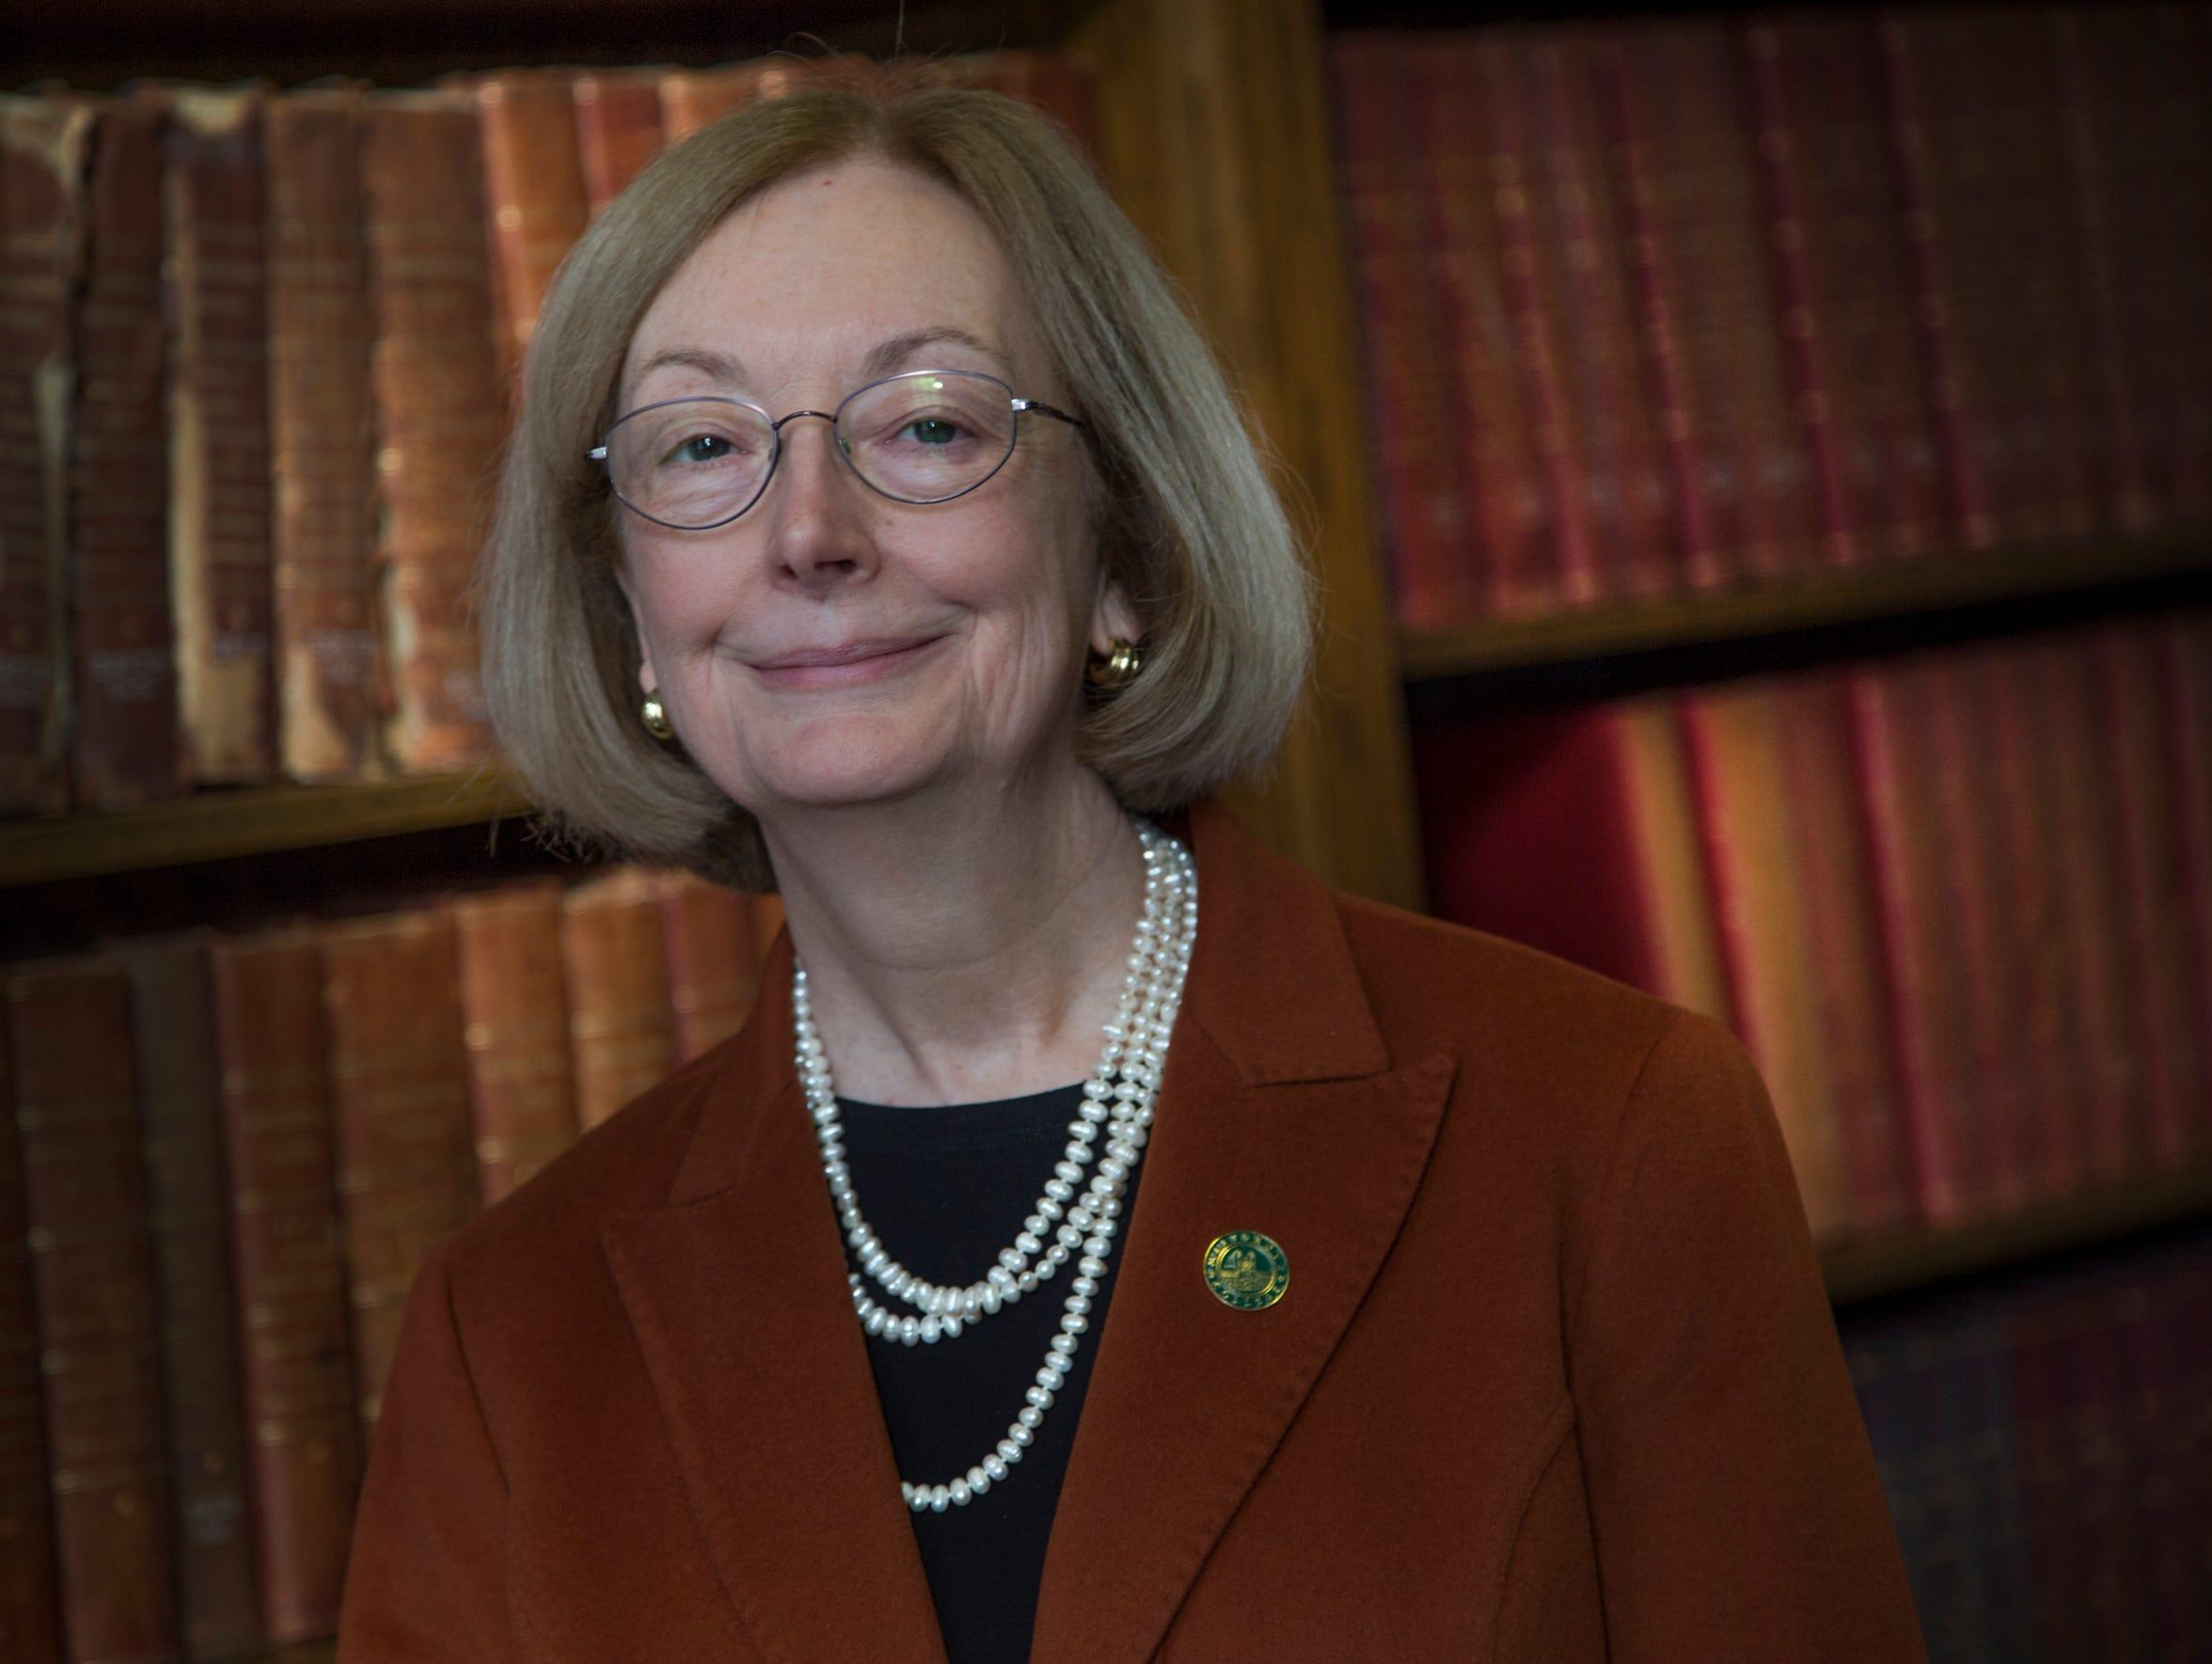 Marygrove College president Elizabeth Burns talks about